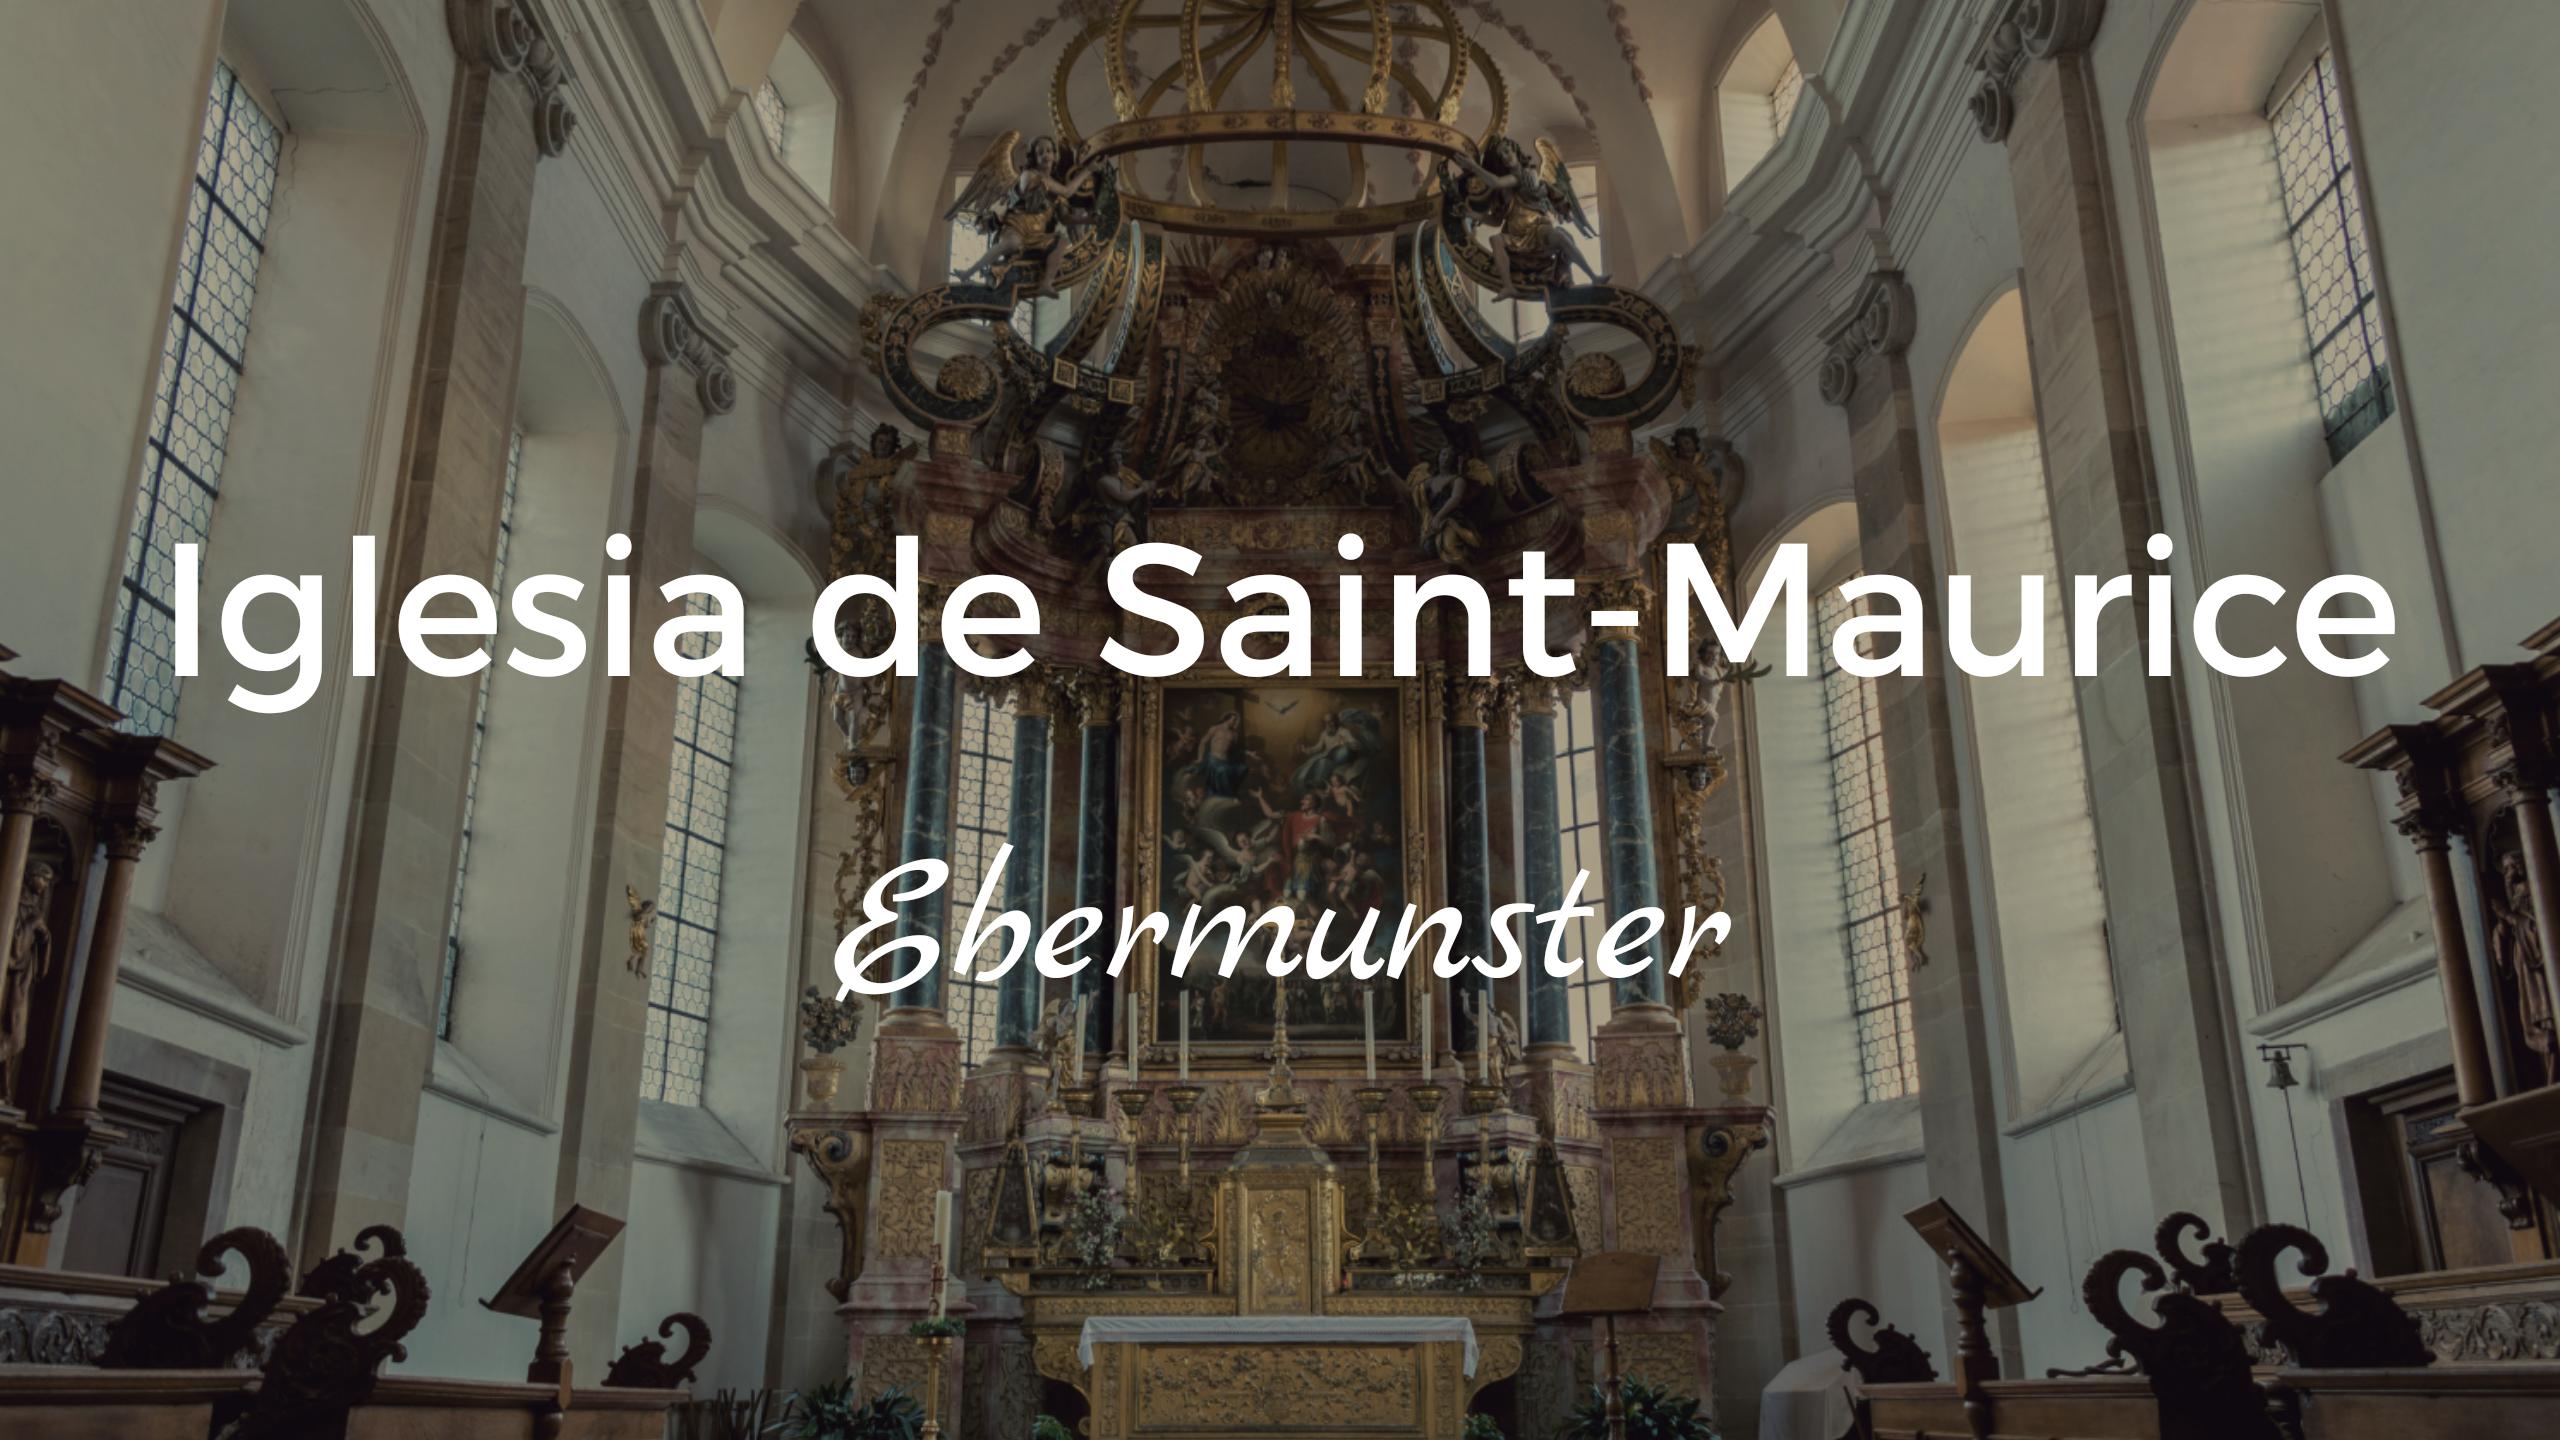 Iglesia de Saint-Maurice (Ebermunster)